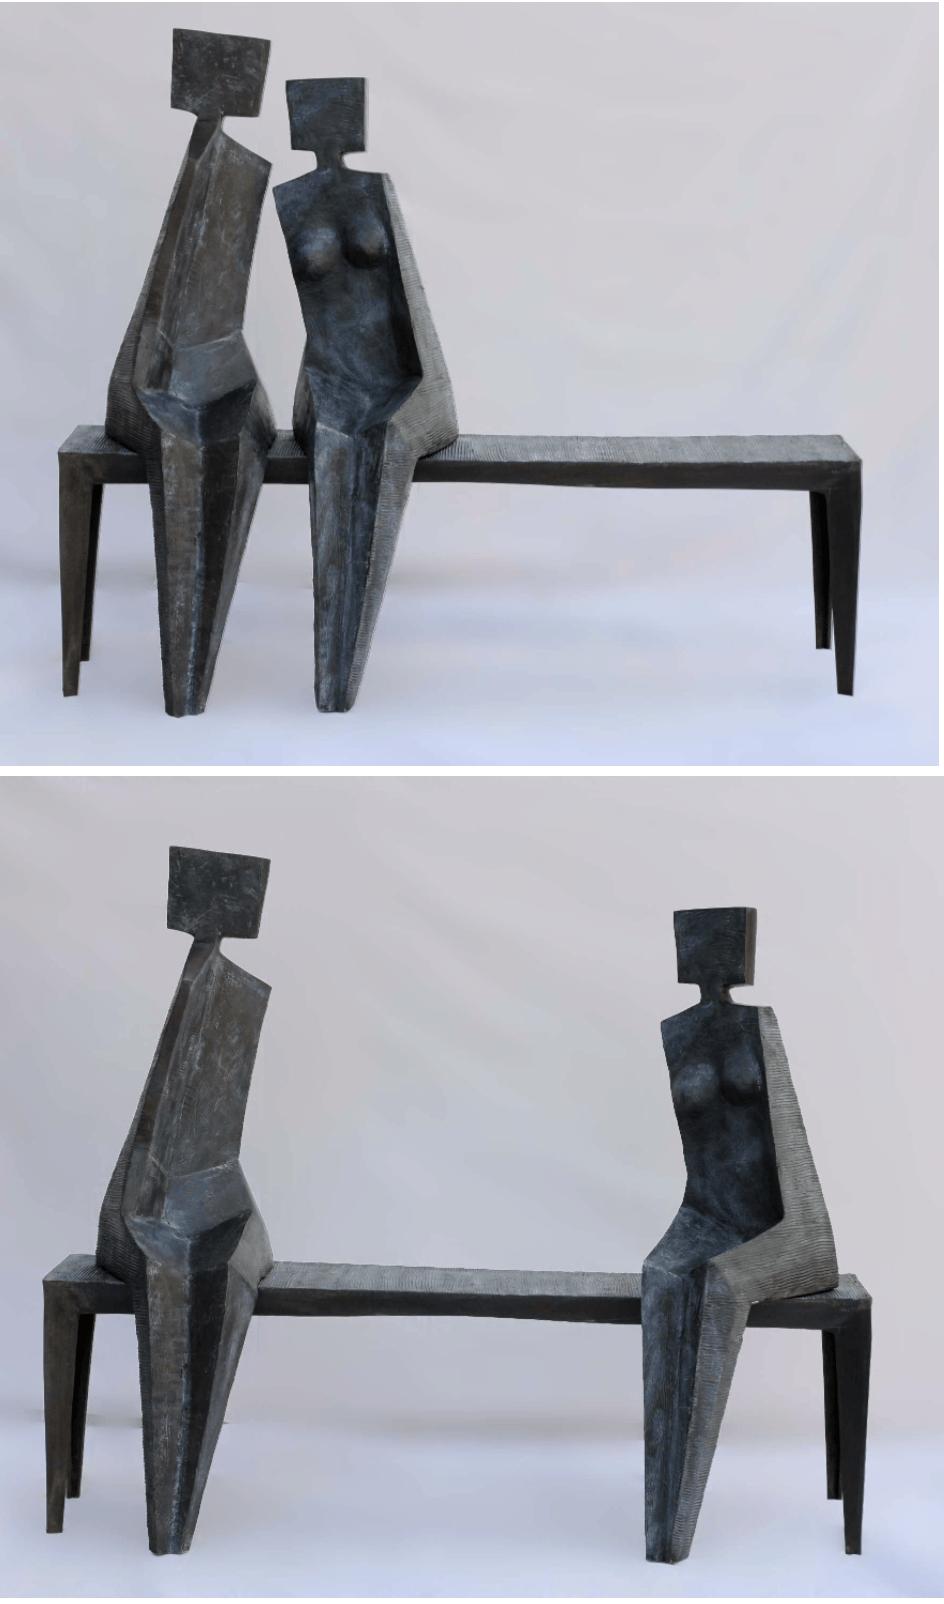 ORIGAMI Bronze 150x130x55 cm /59x51x21,6 inches inches